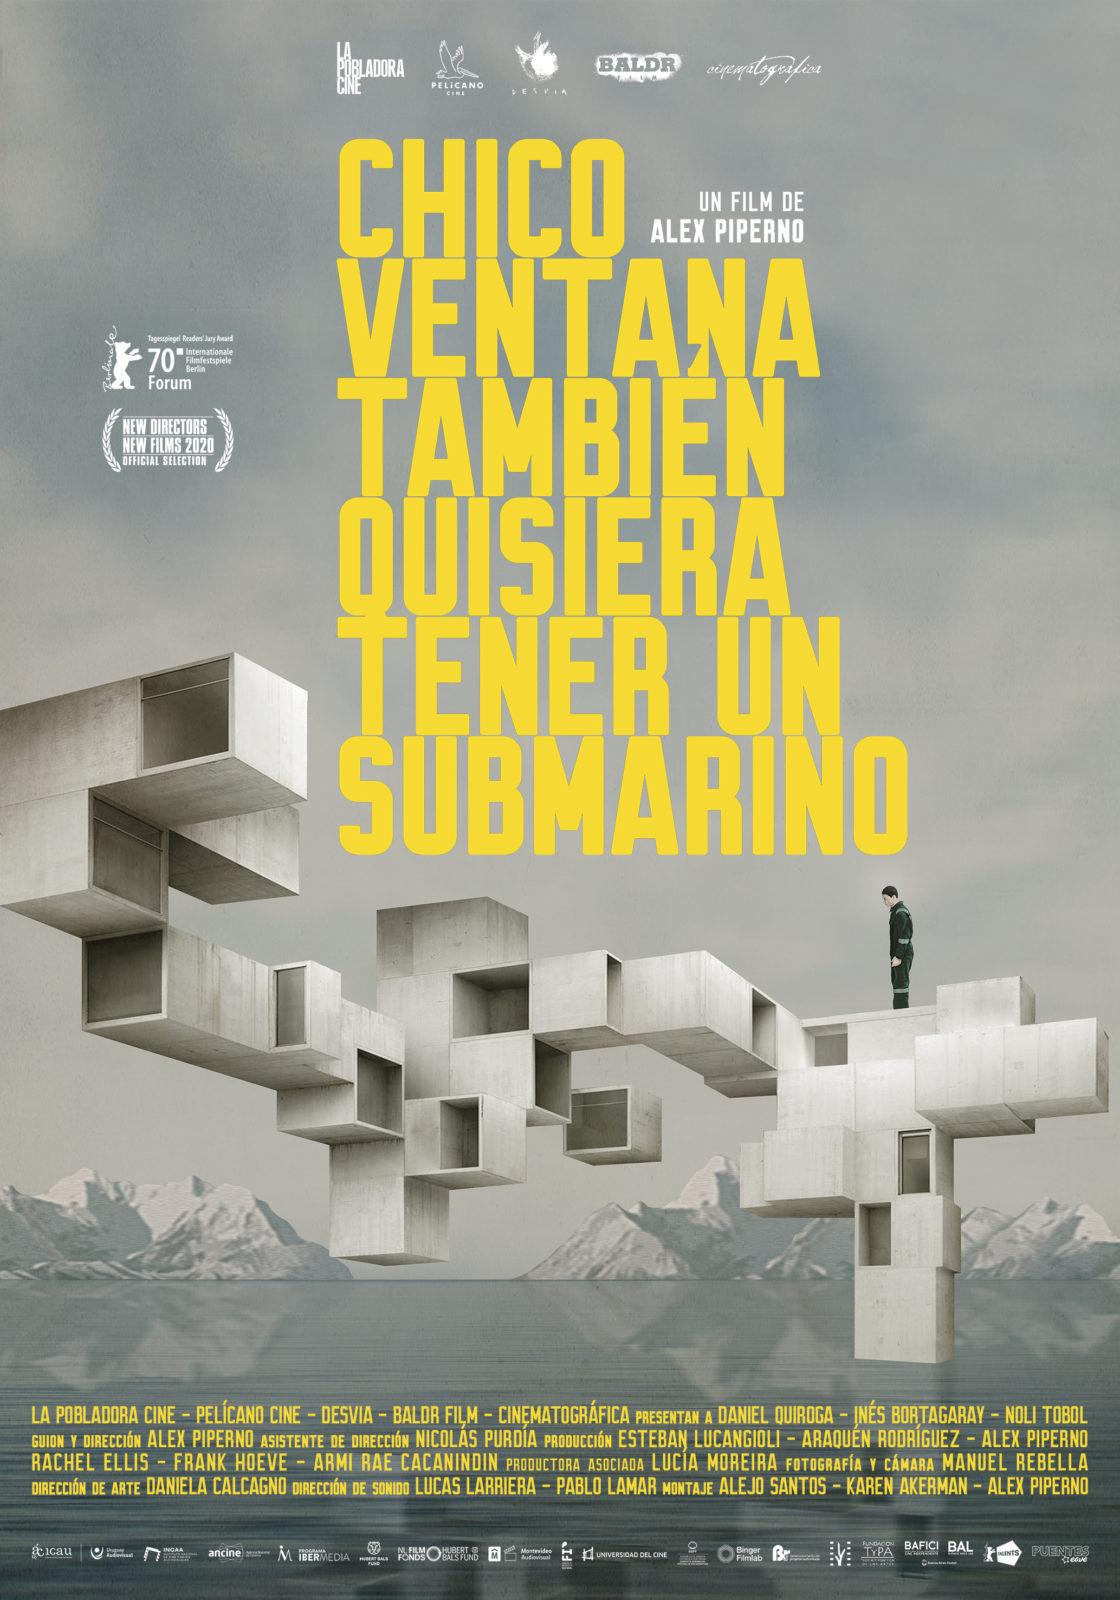 Chico ventana también quisiera tener un submarino - Festival de Biarritz  América Latina